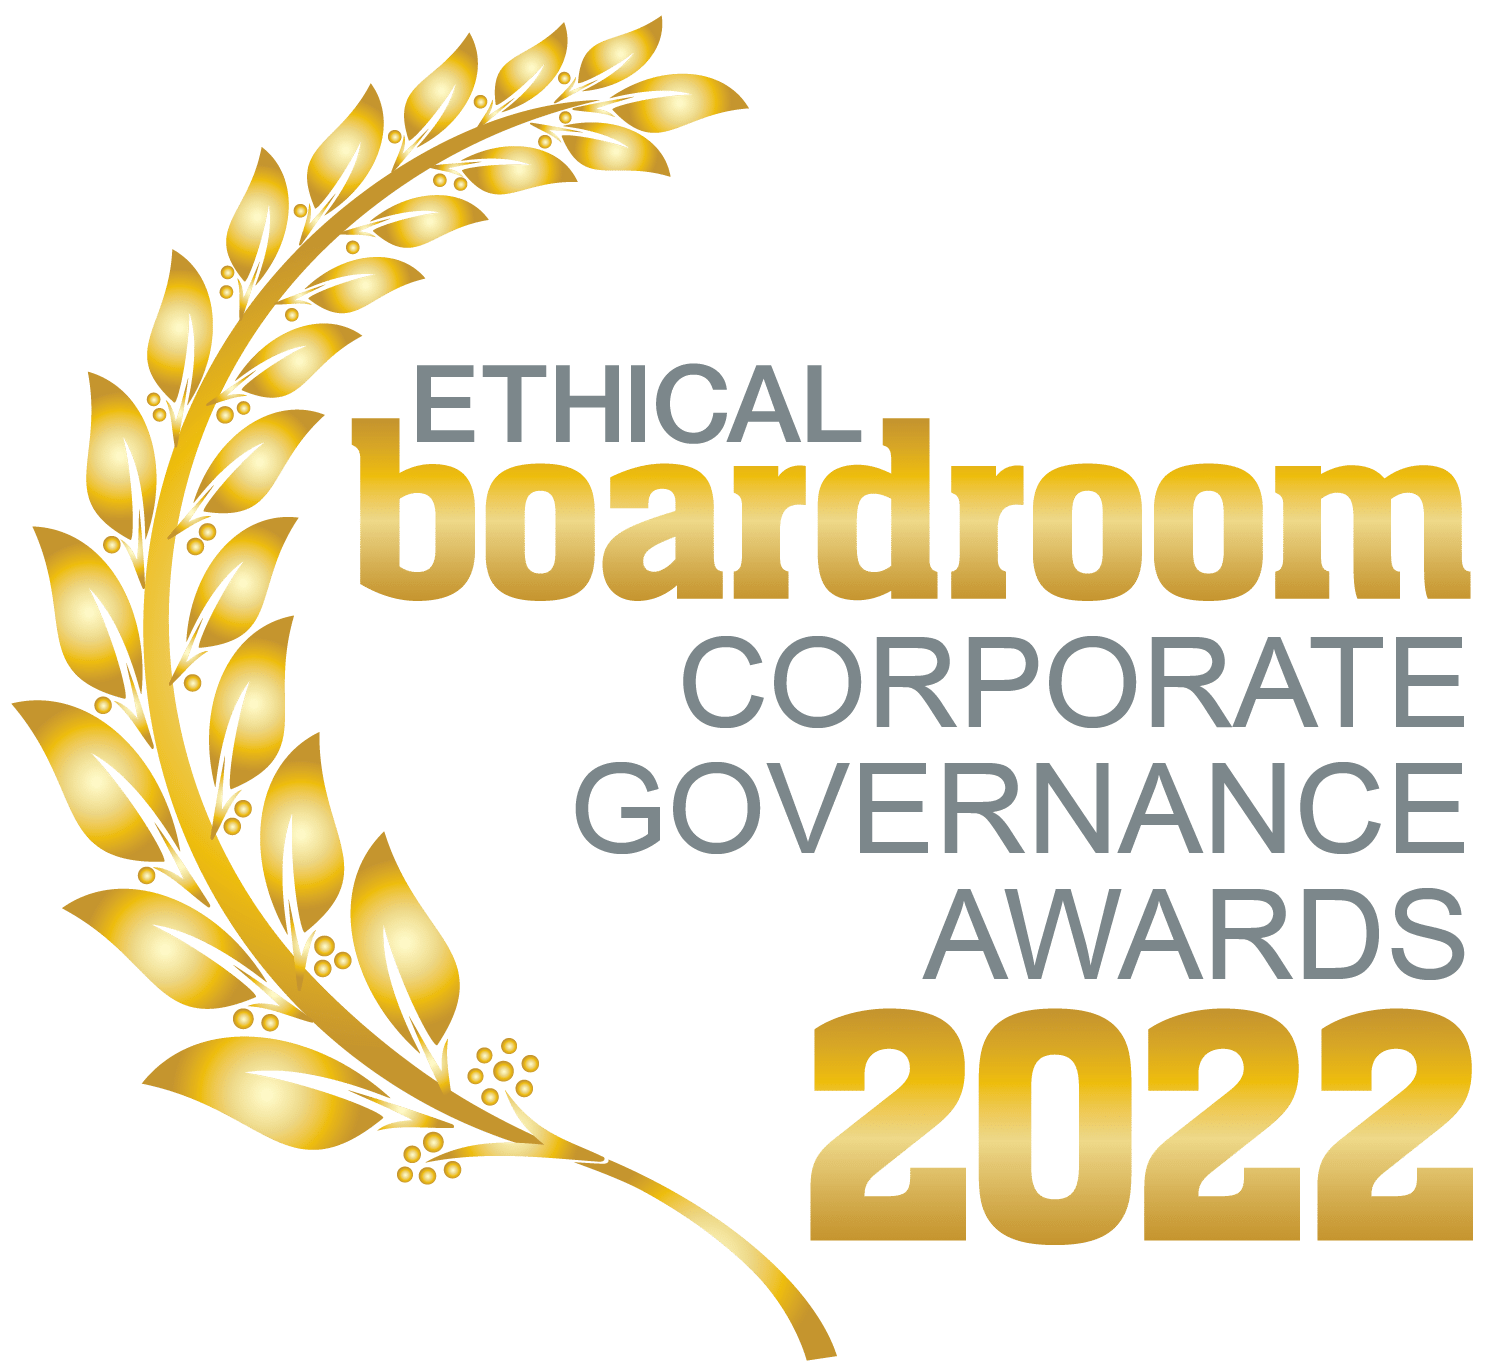 Awards Methodology Ethical Boardroom